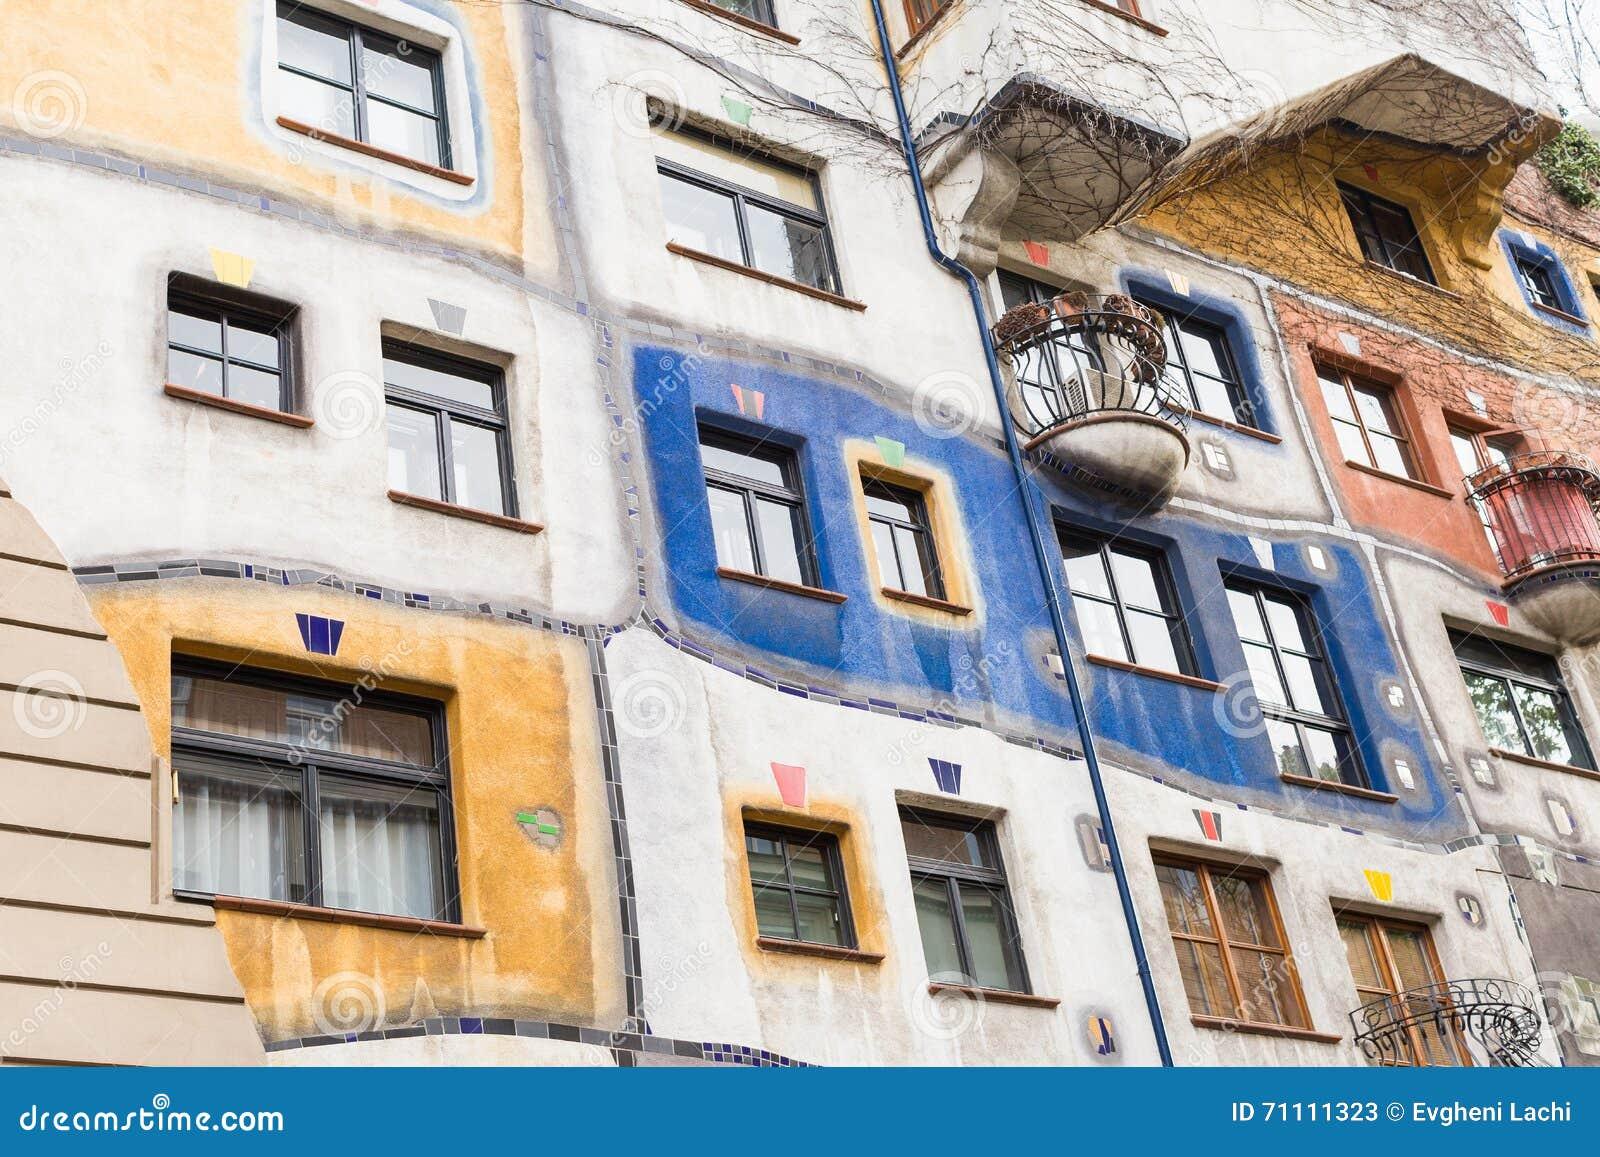 Österrike hushundertwasser vienna